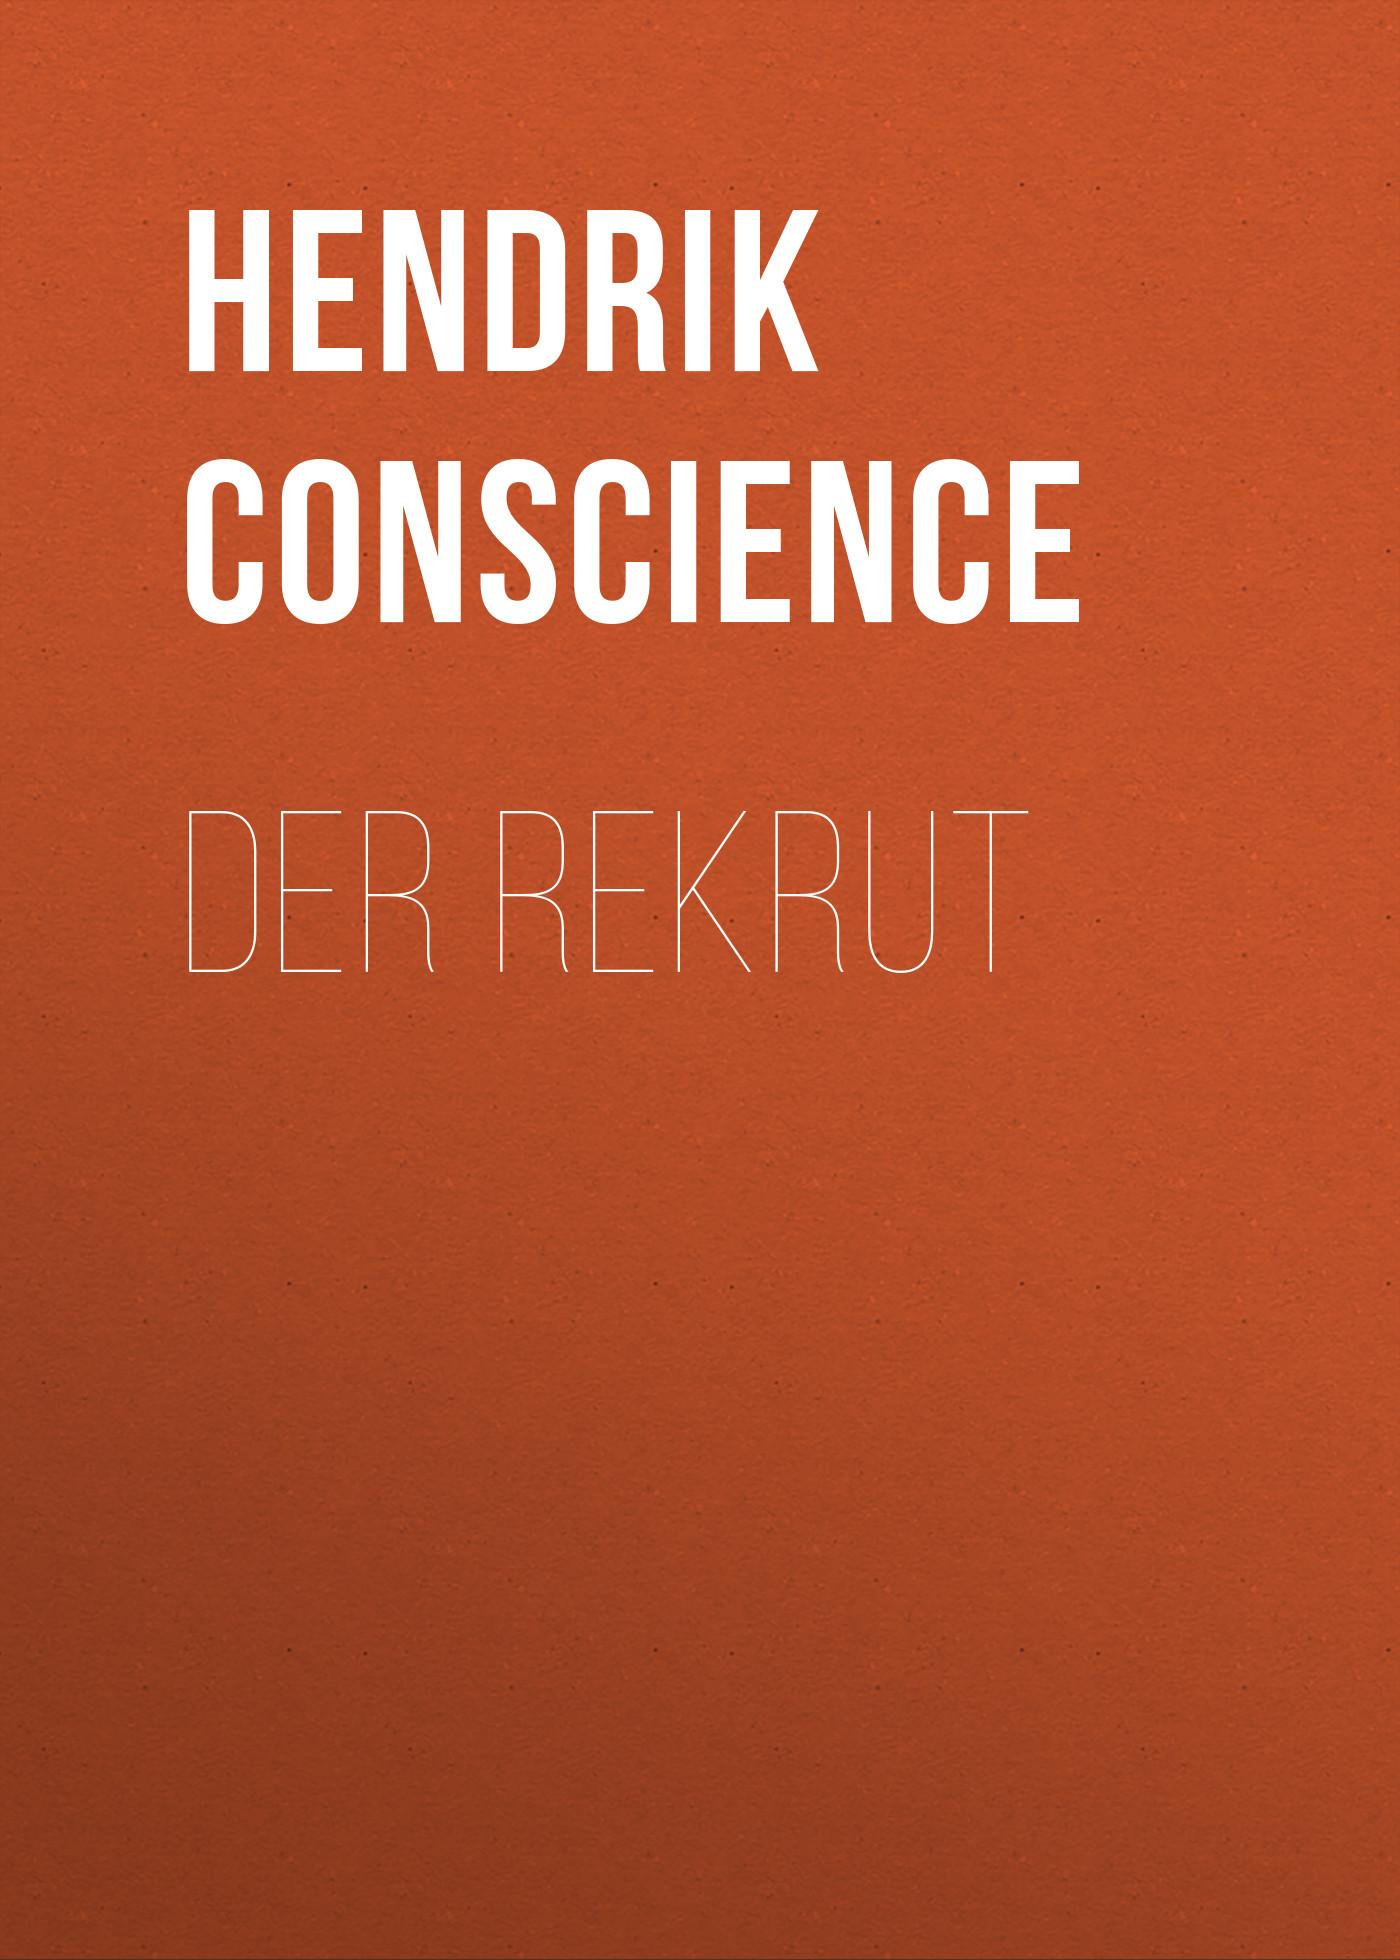 Hendrik Conscience Der Rekrut ilves toomas hendrik suurem eesti